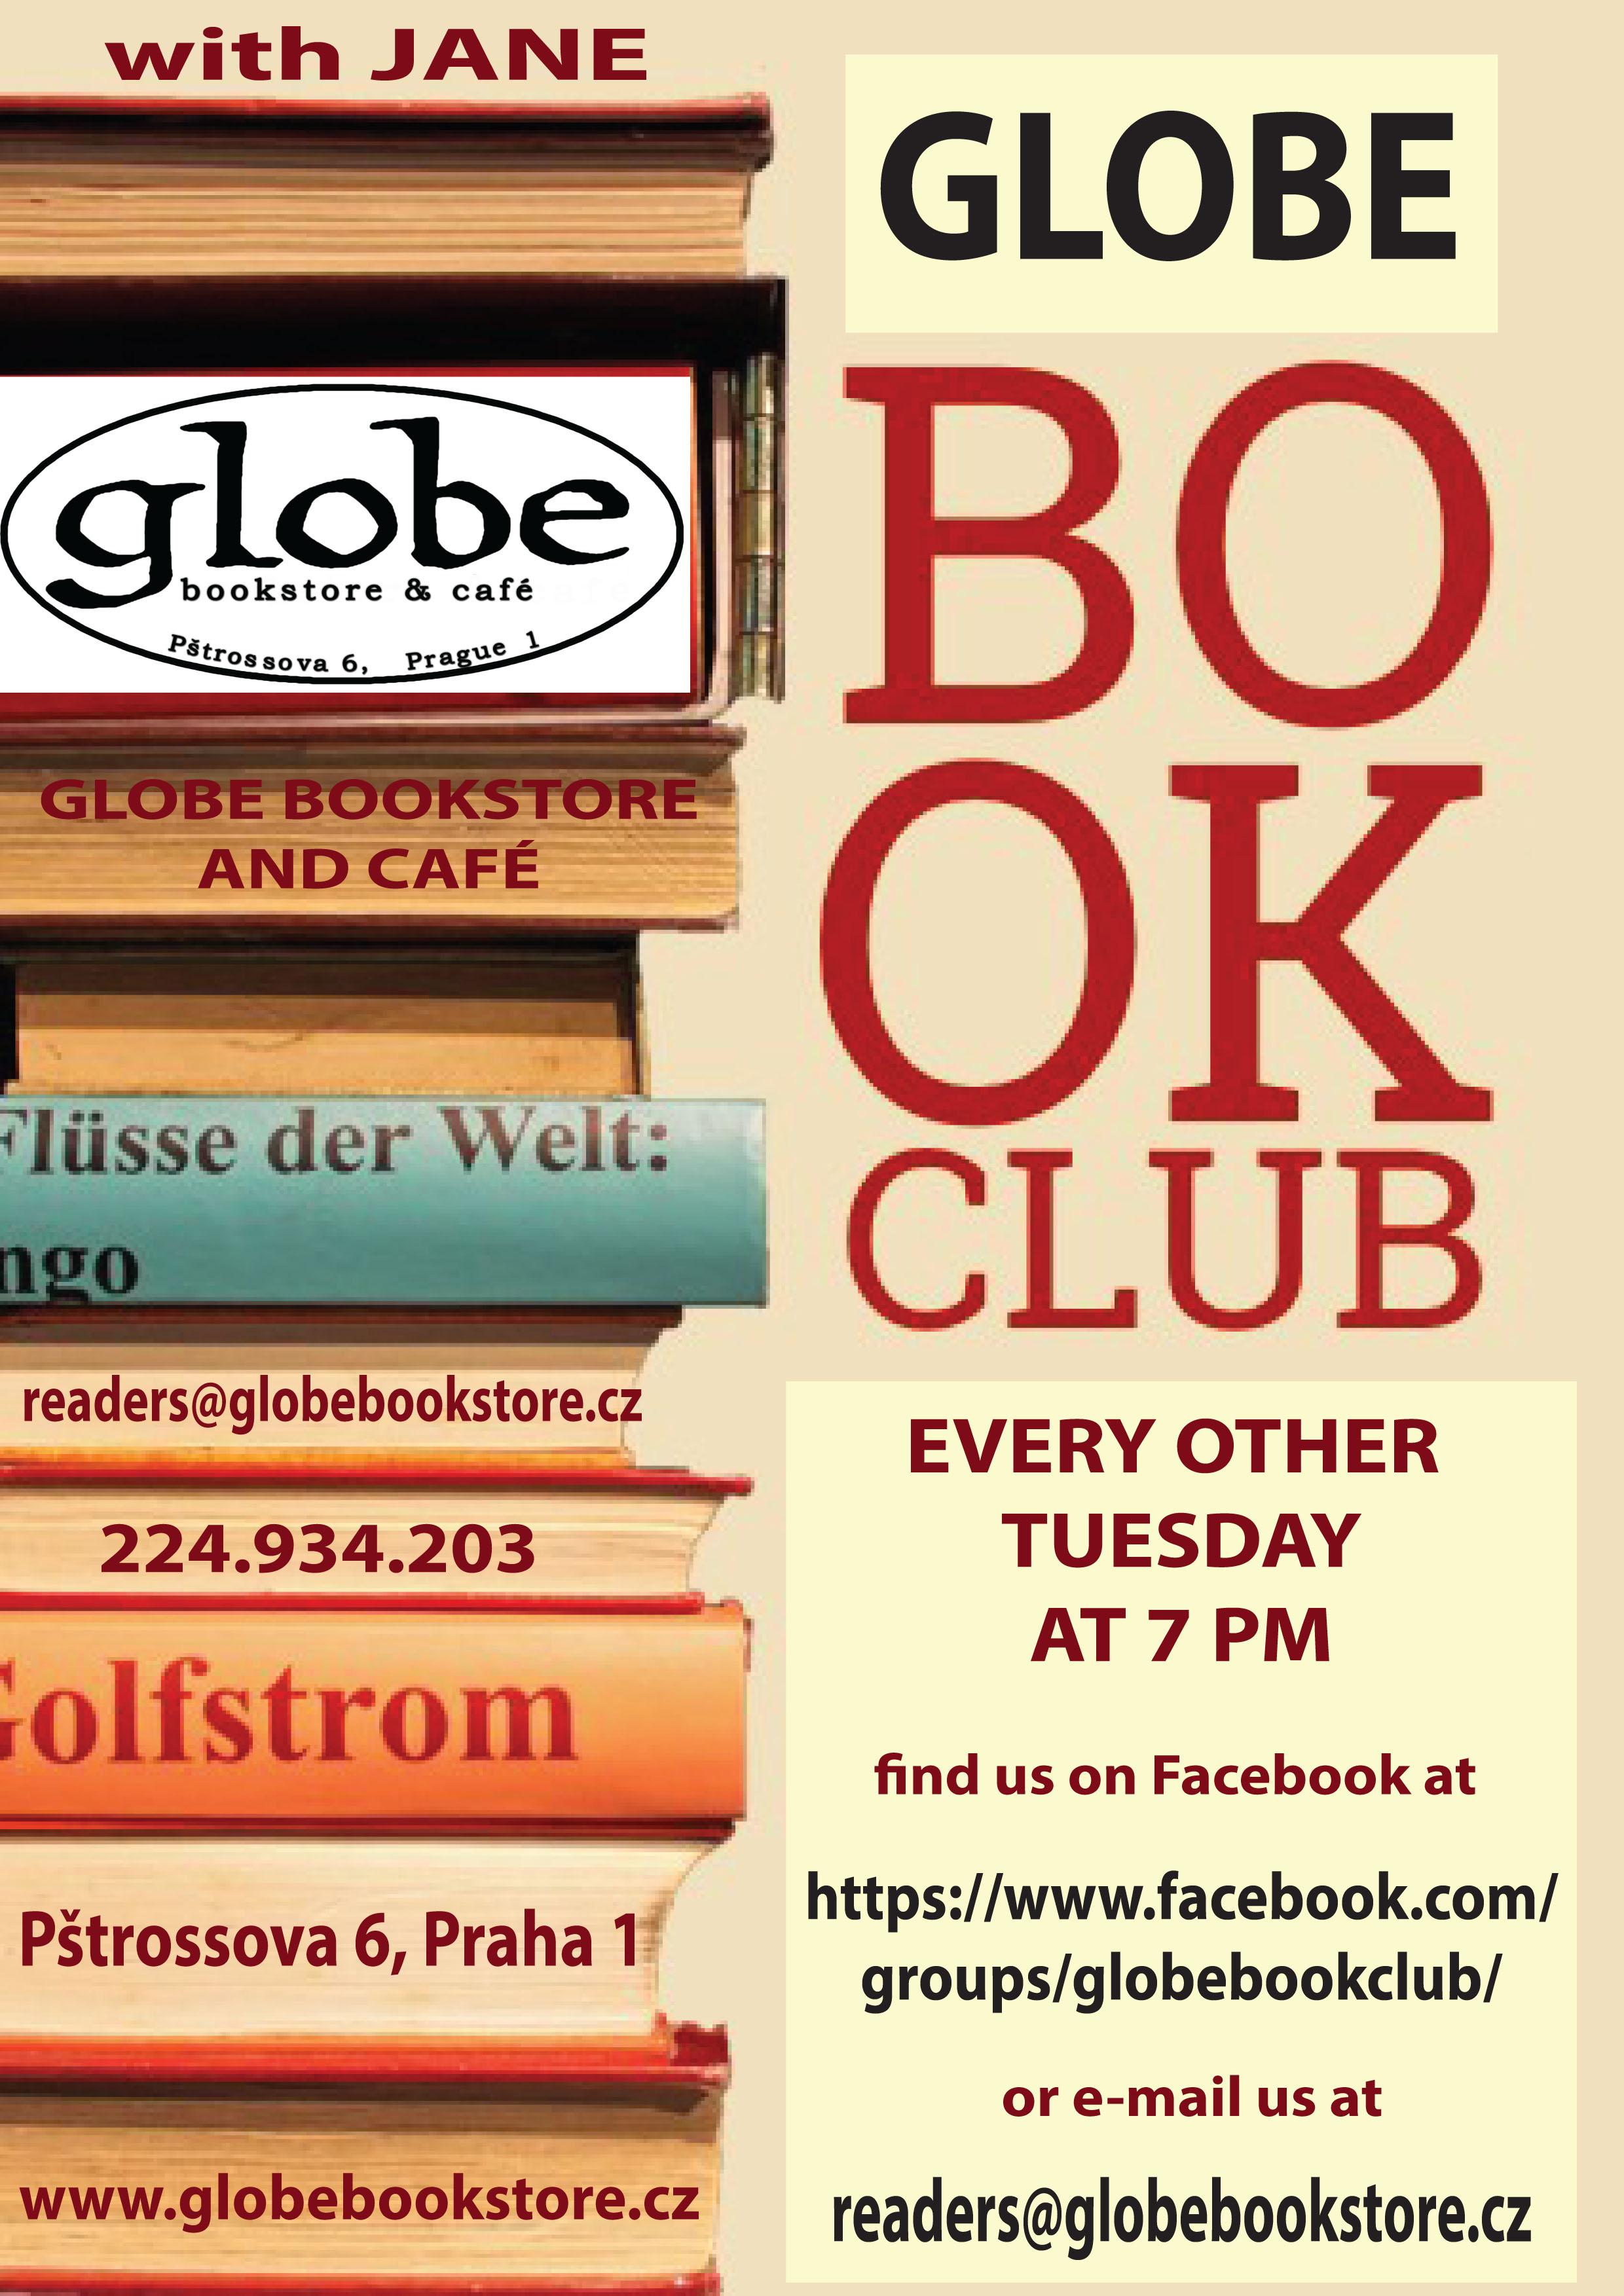 book club flyer gener